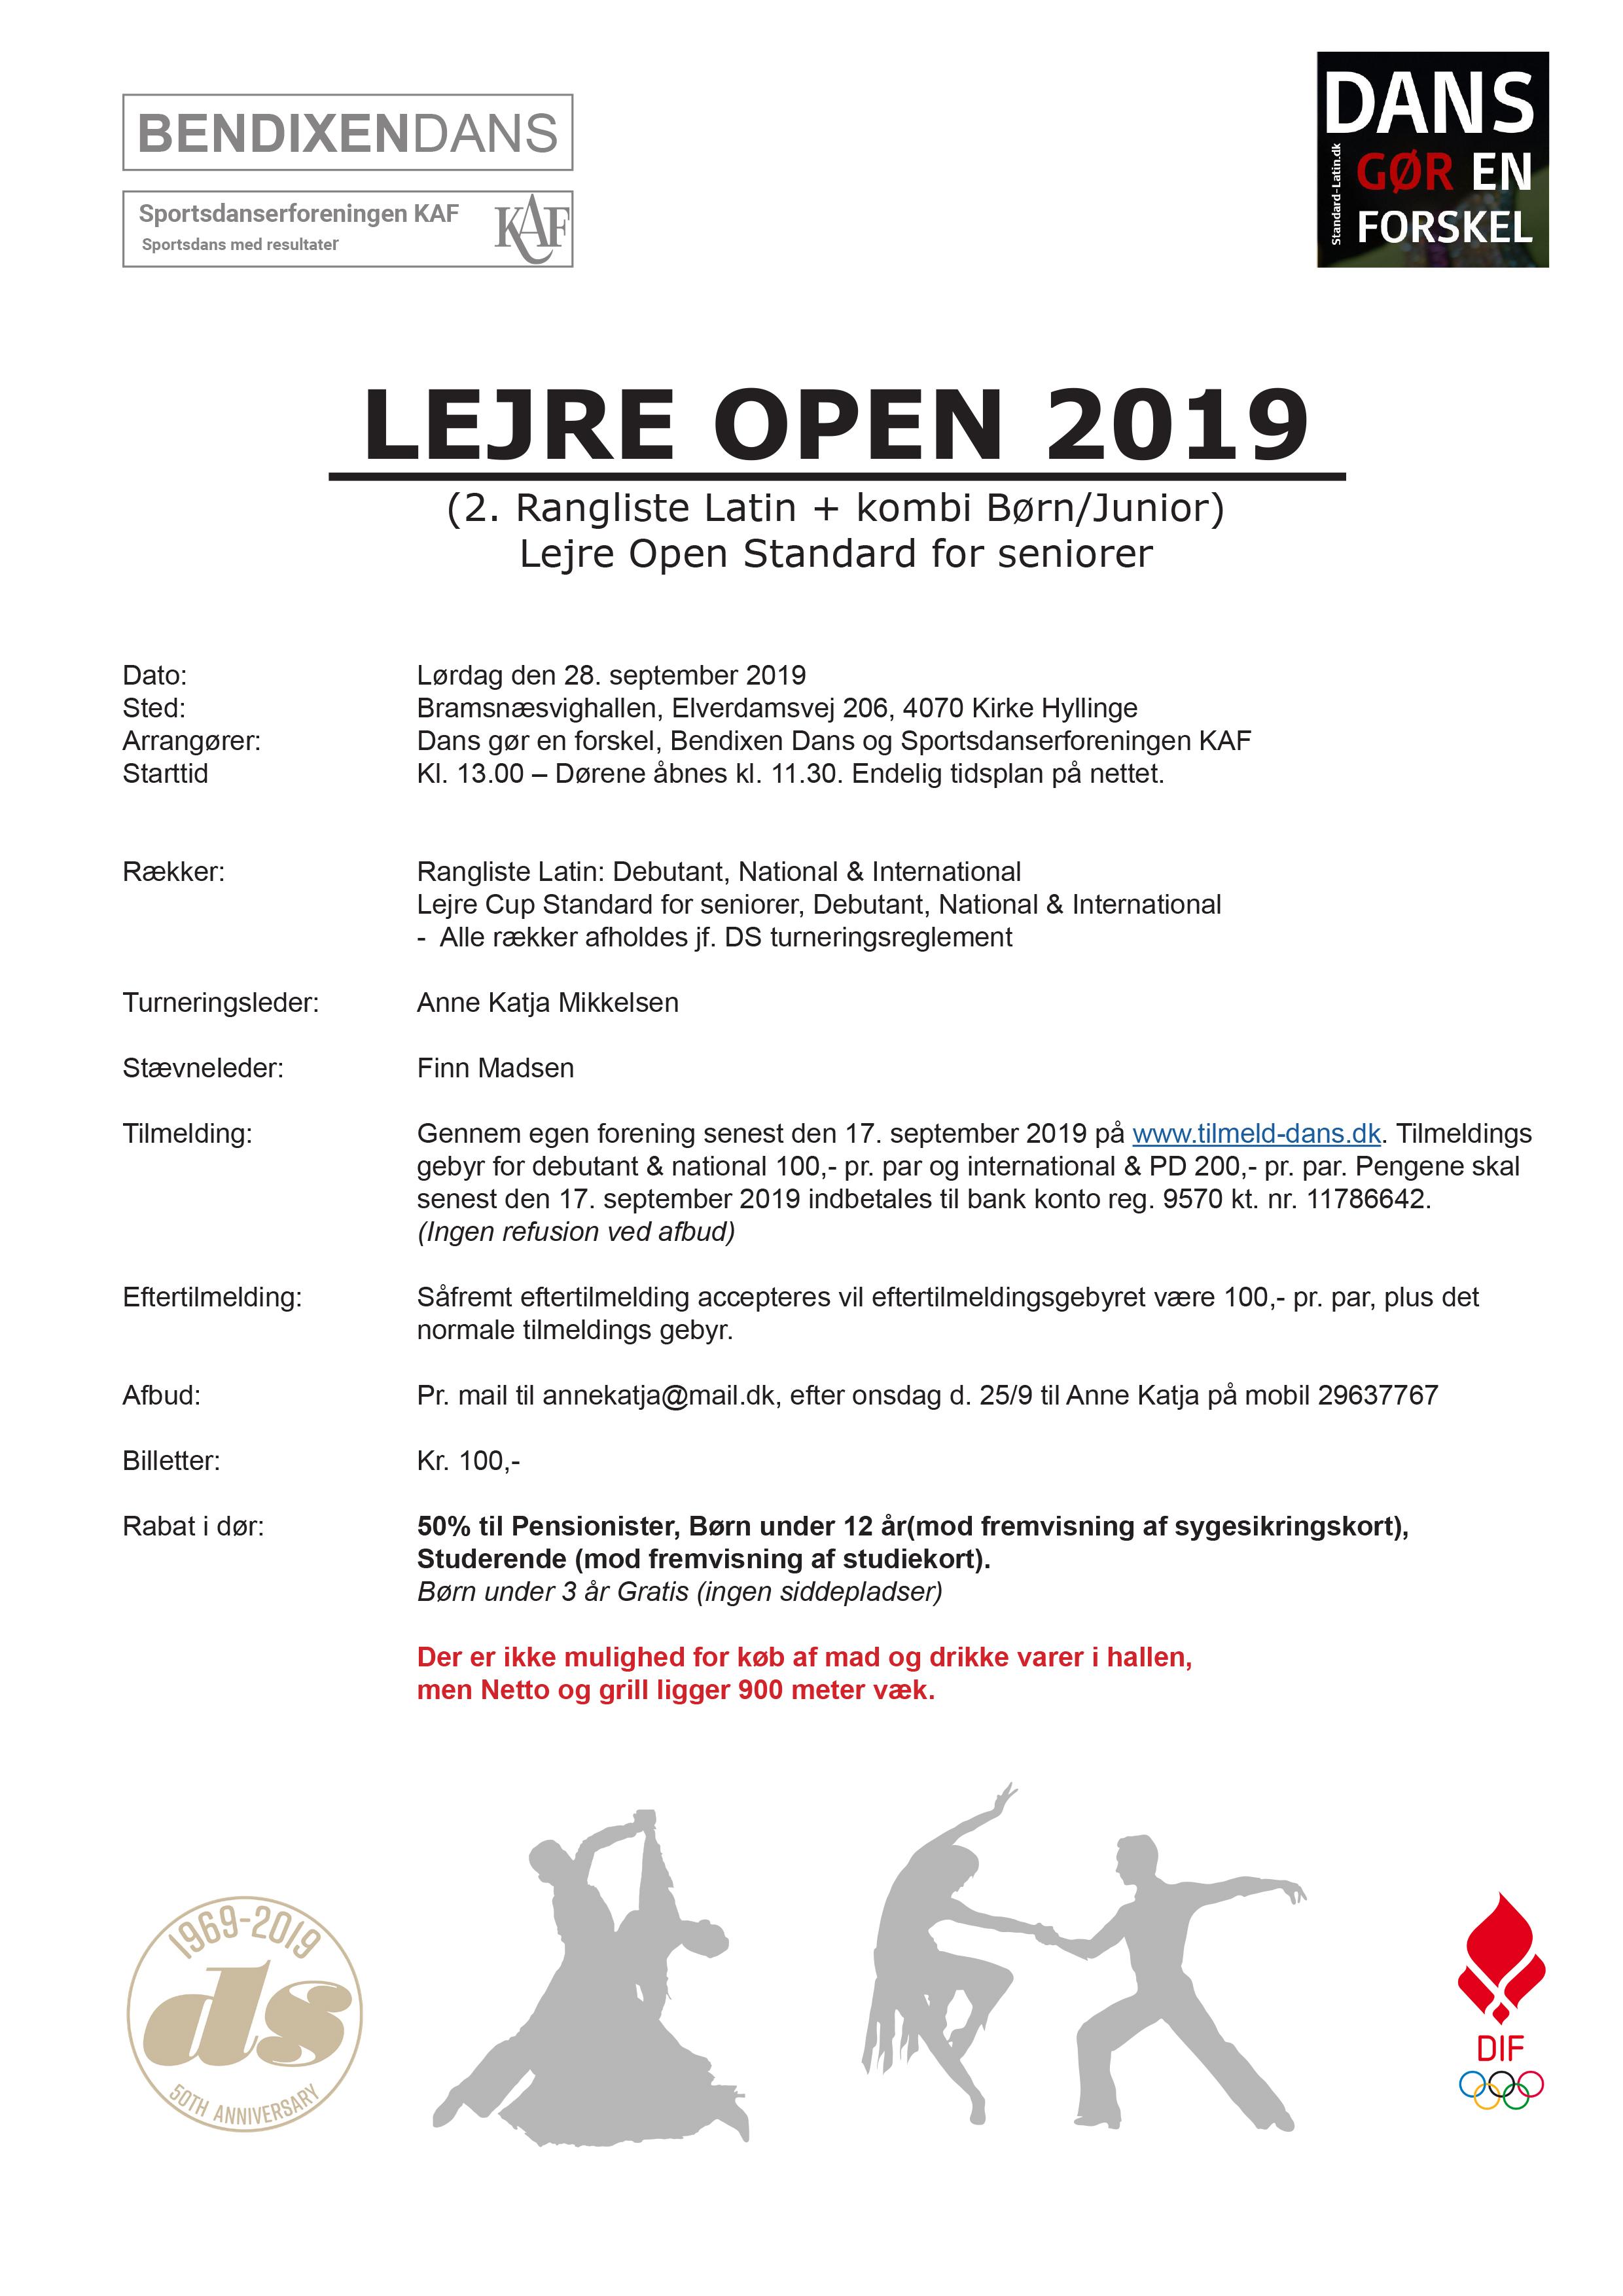 [DS] 2. rangliste i latin + kombi Børn/Junior (Lejre Open 2019)